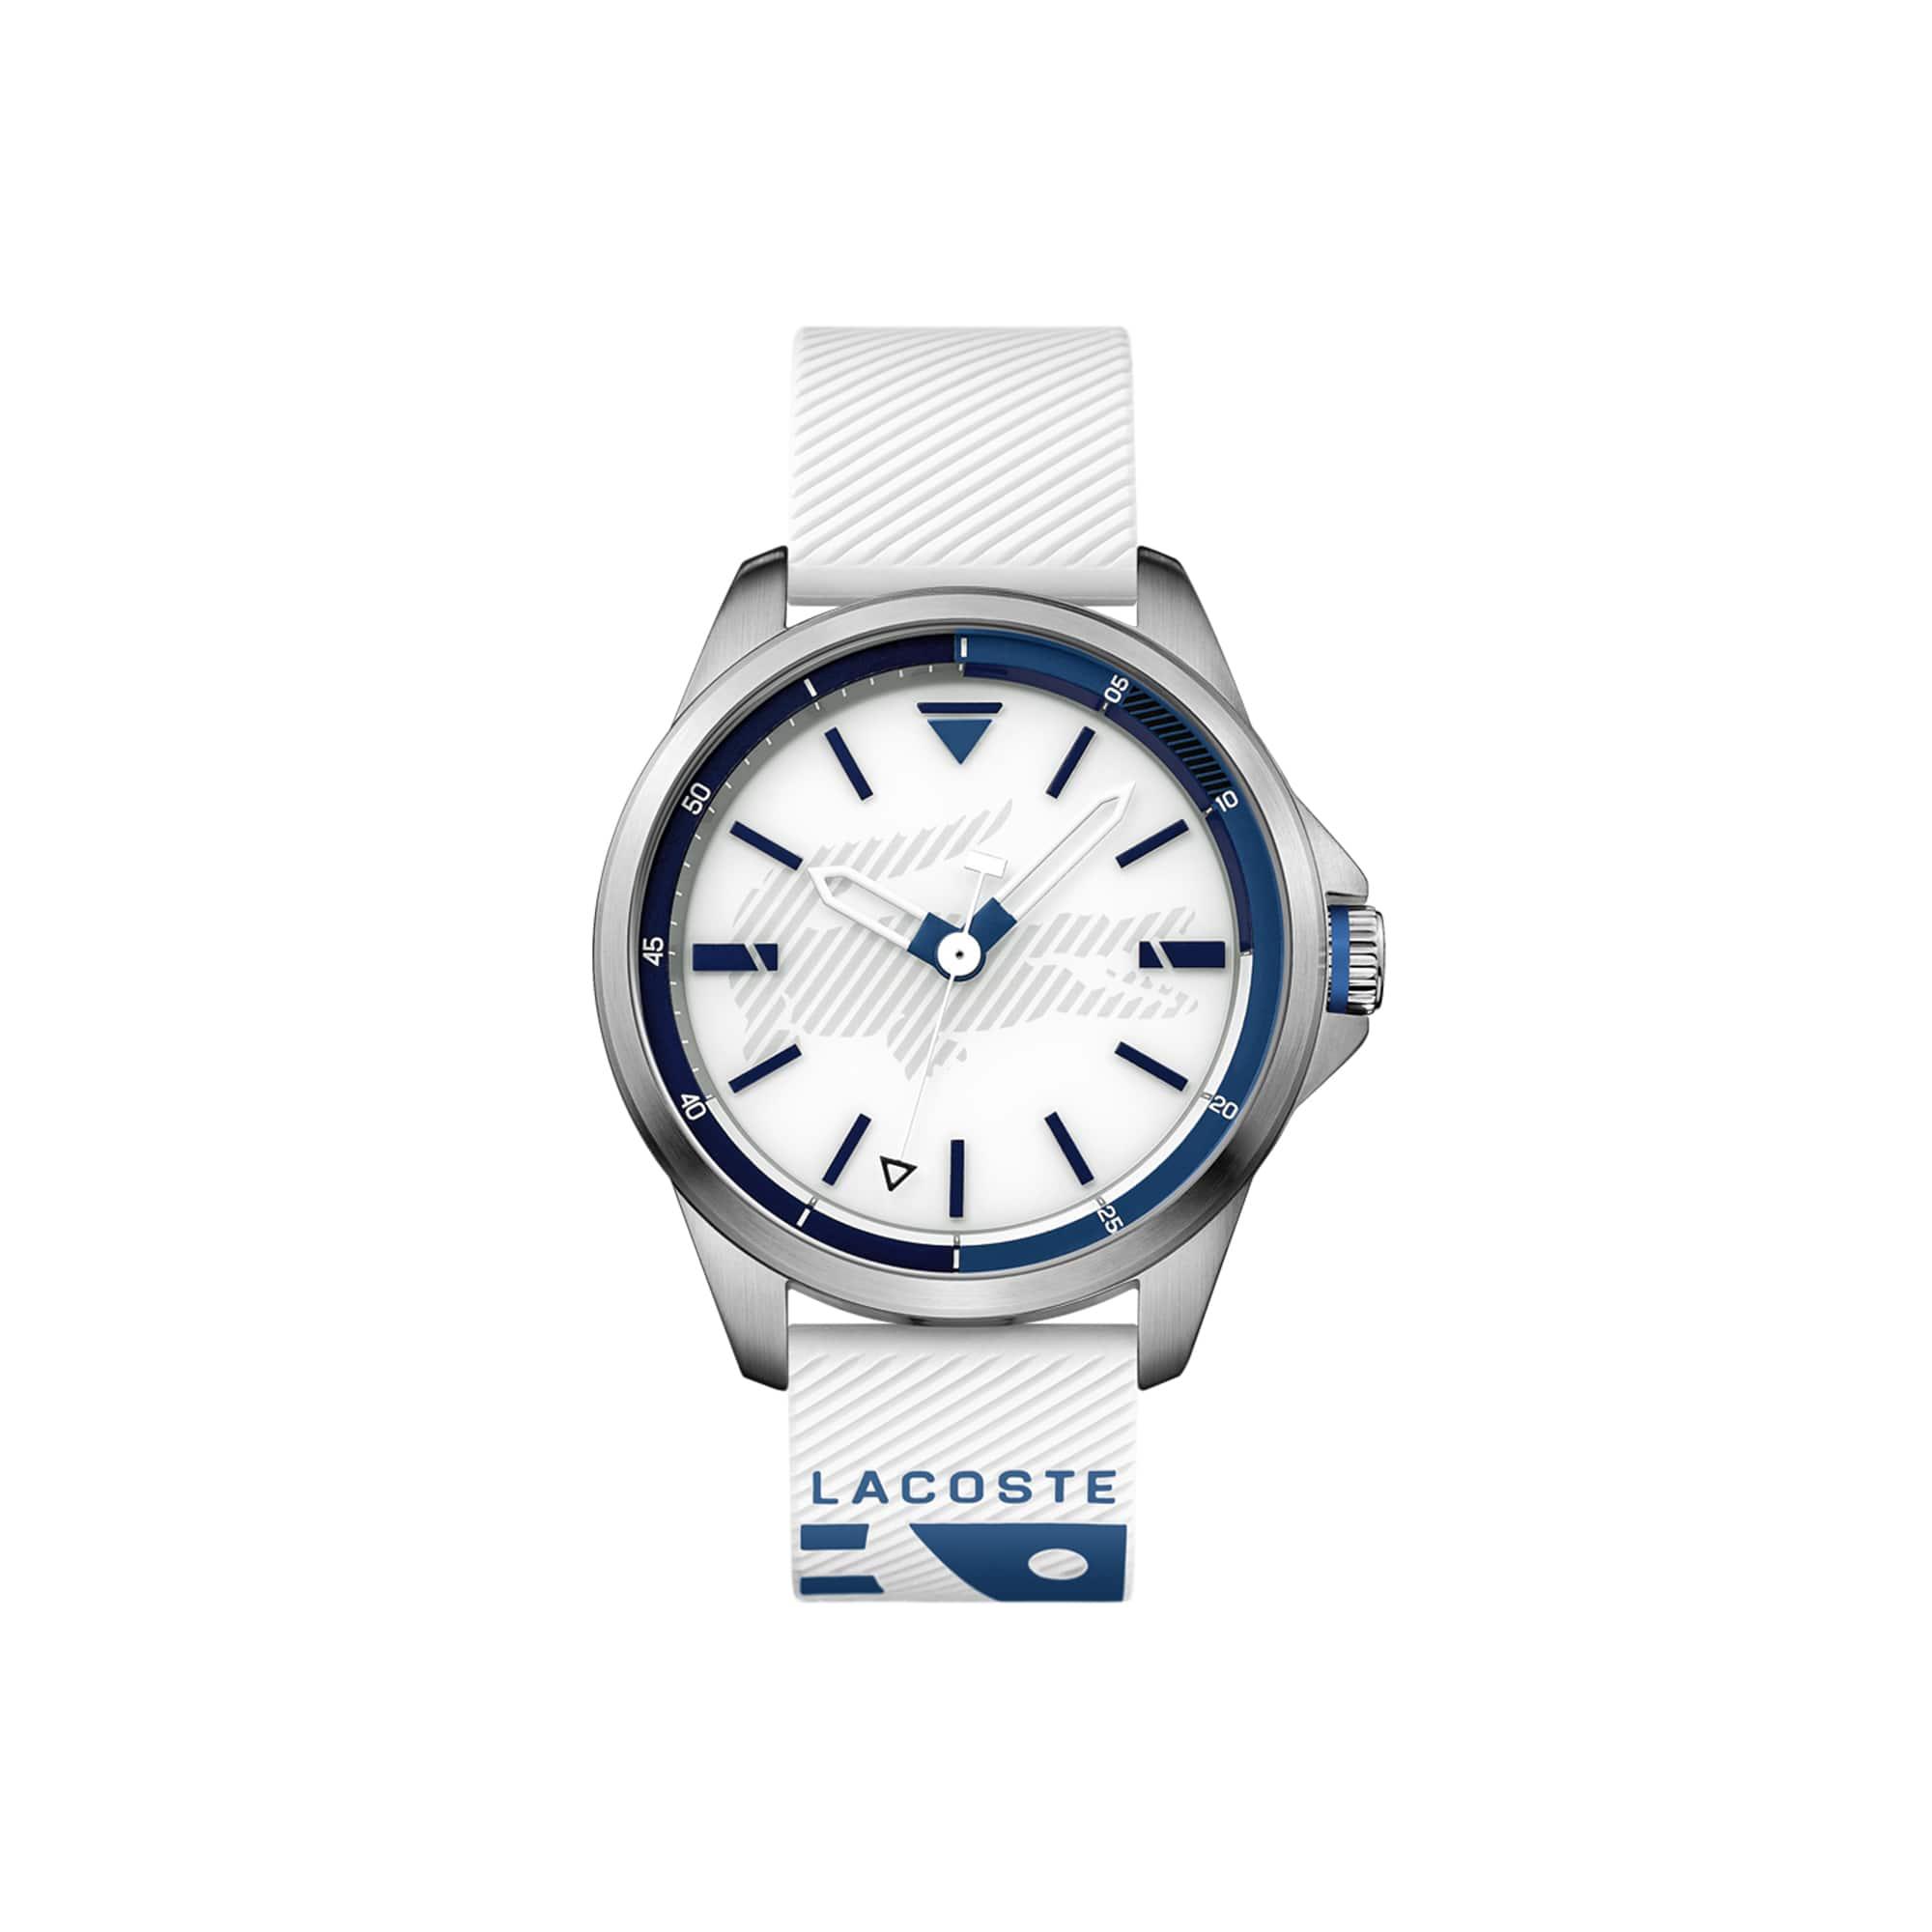 Relógio Capbreton com bracelete em silicone branco